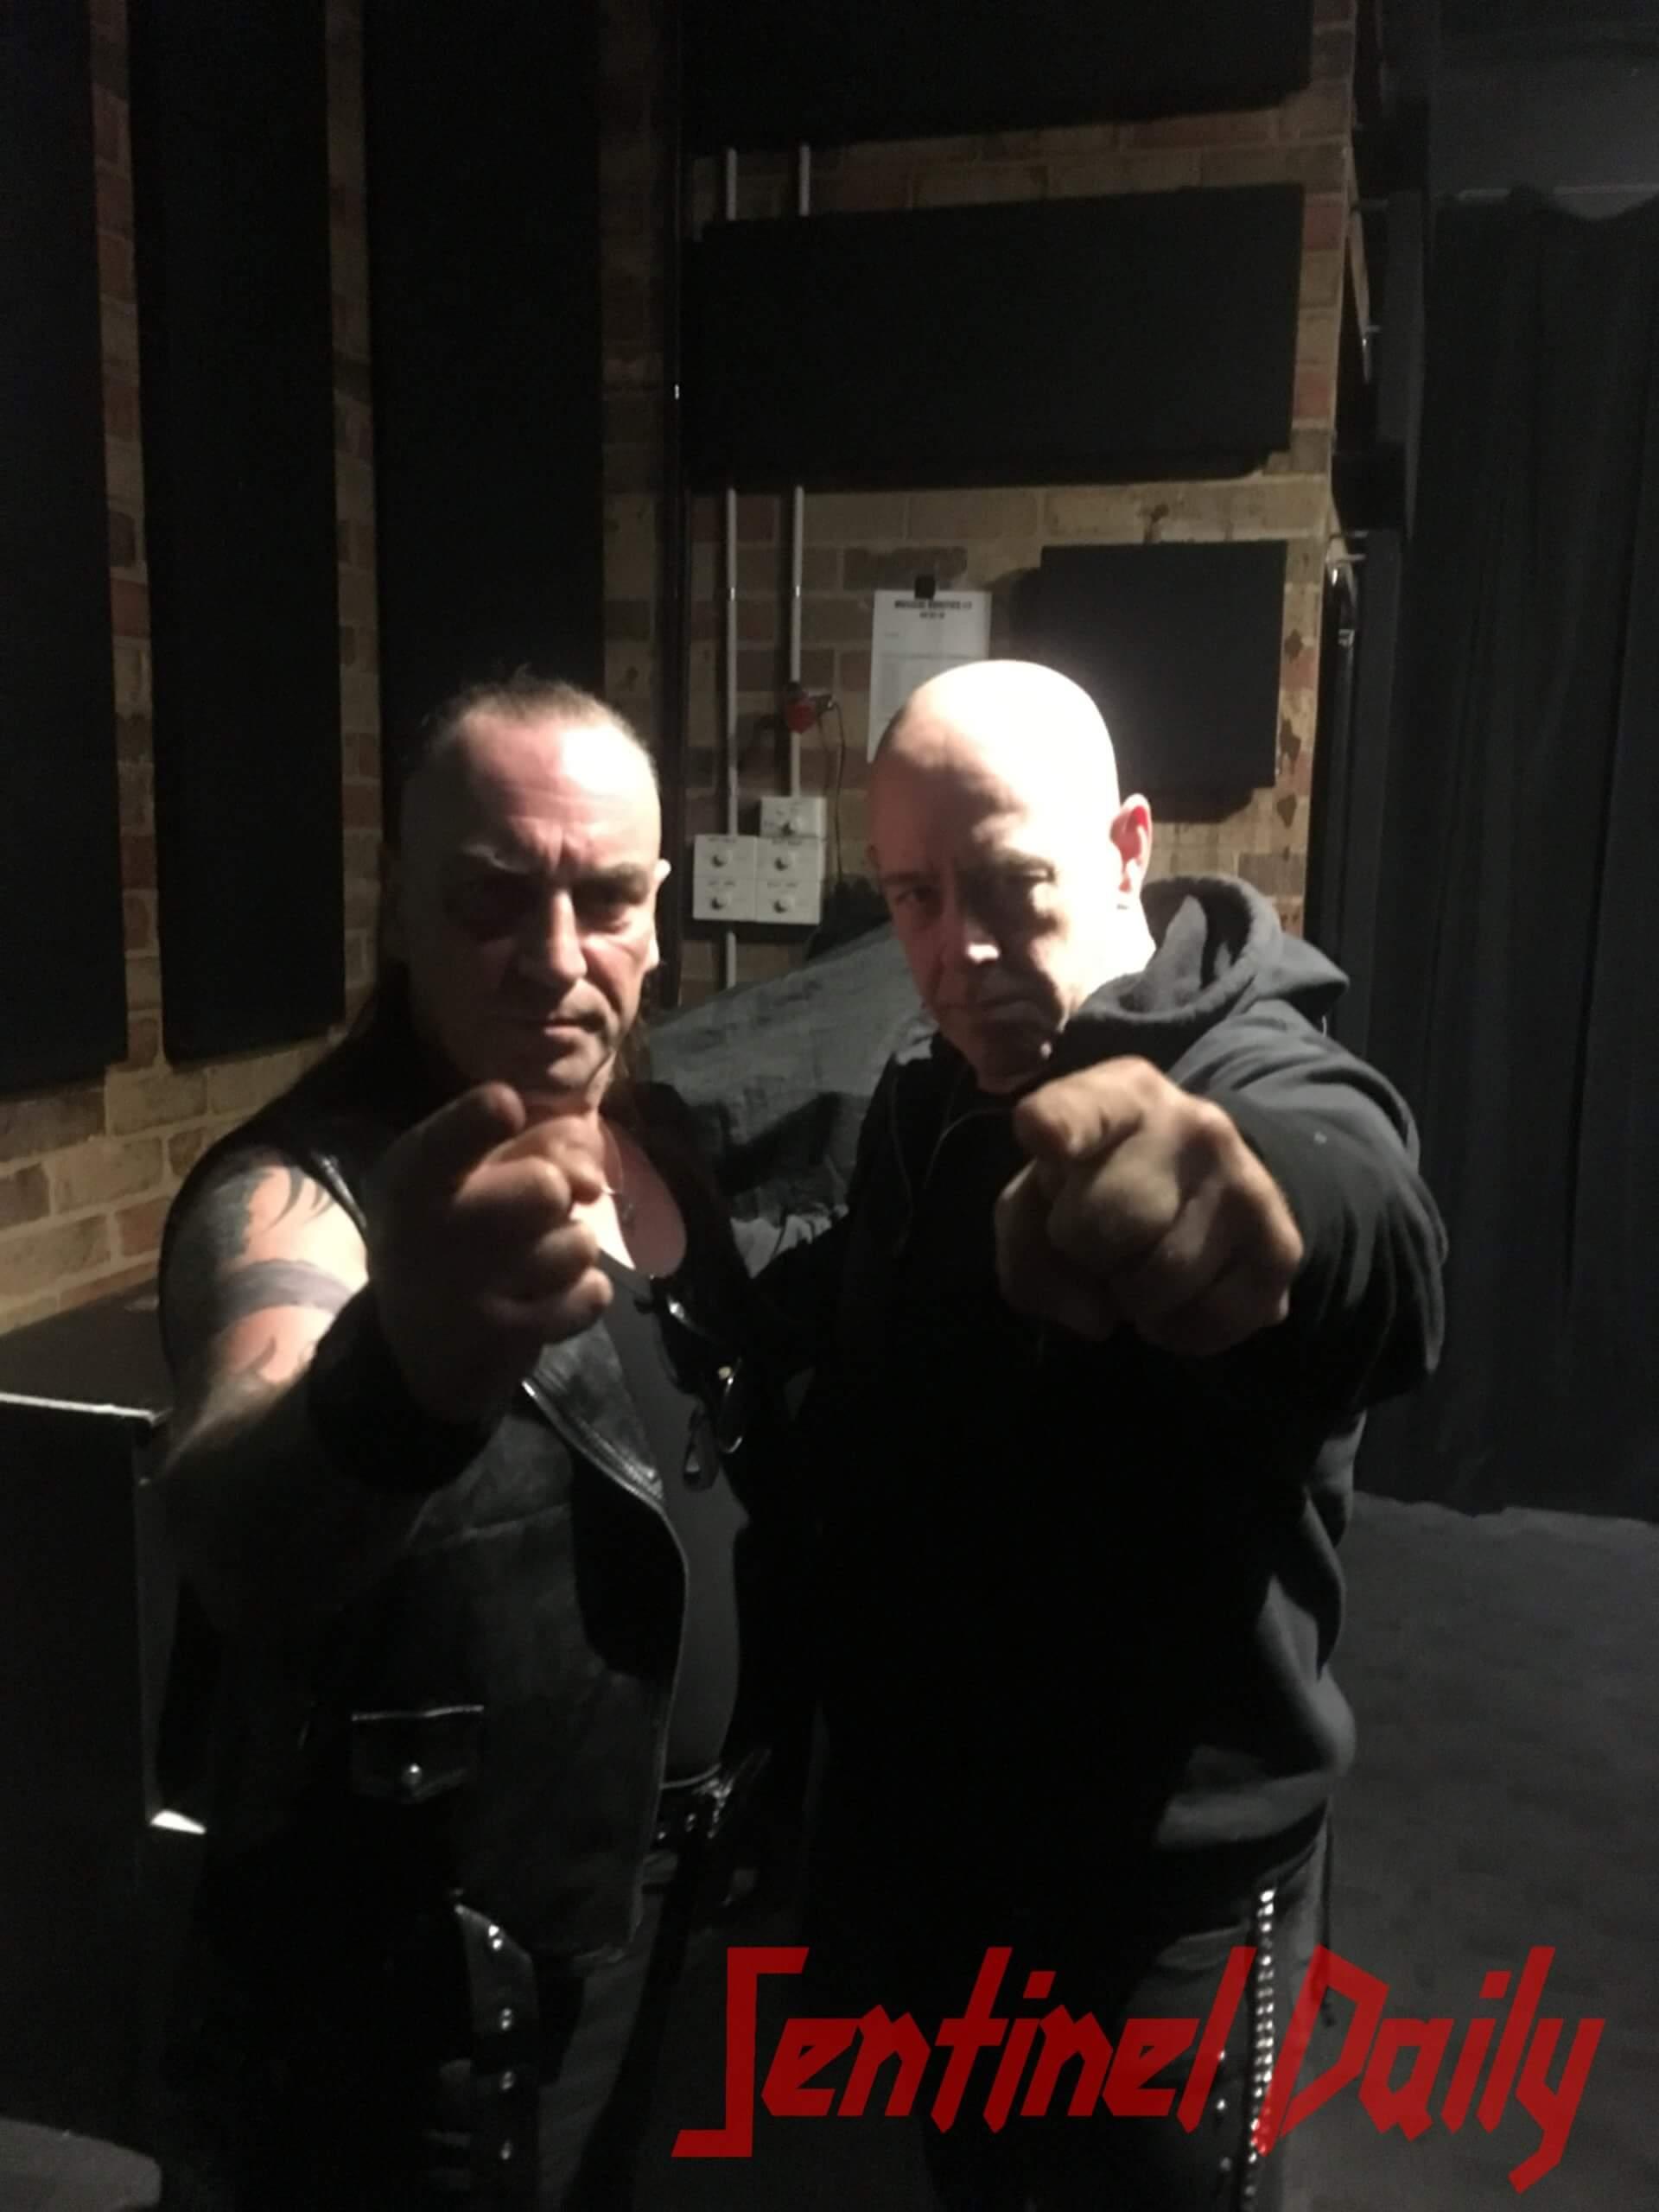 Mantas and Tony